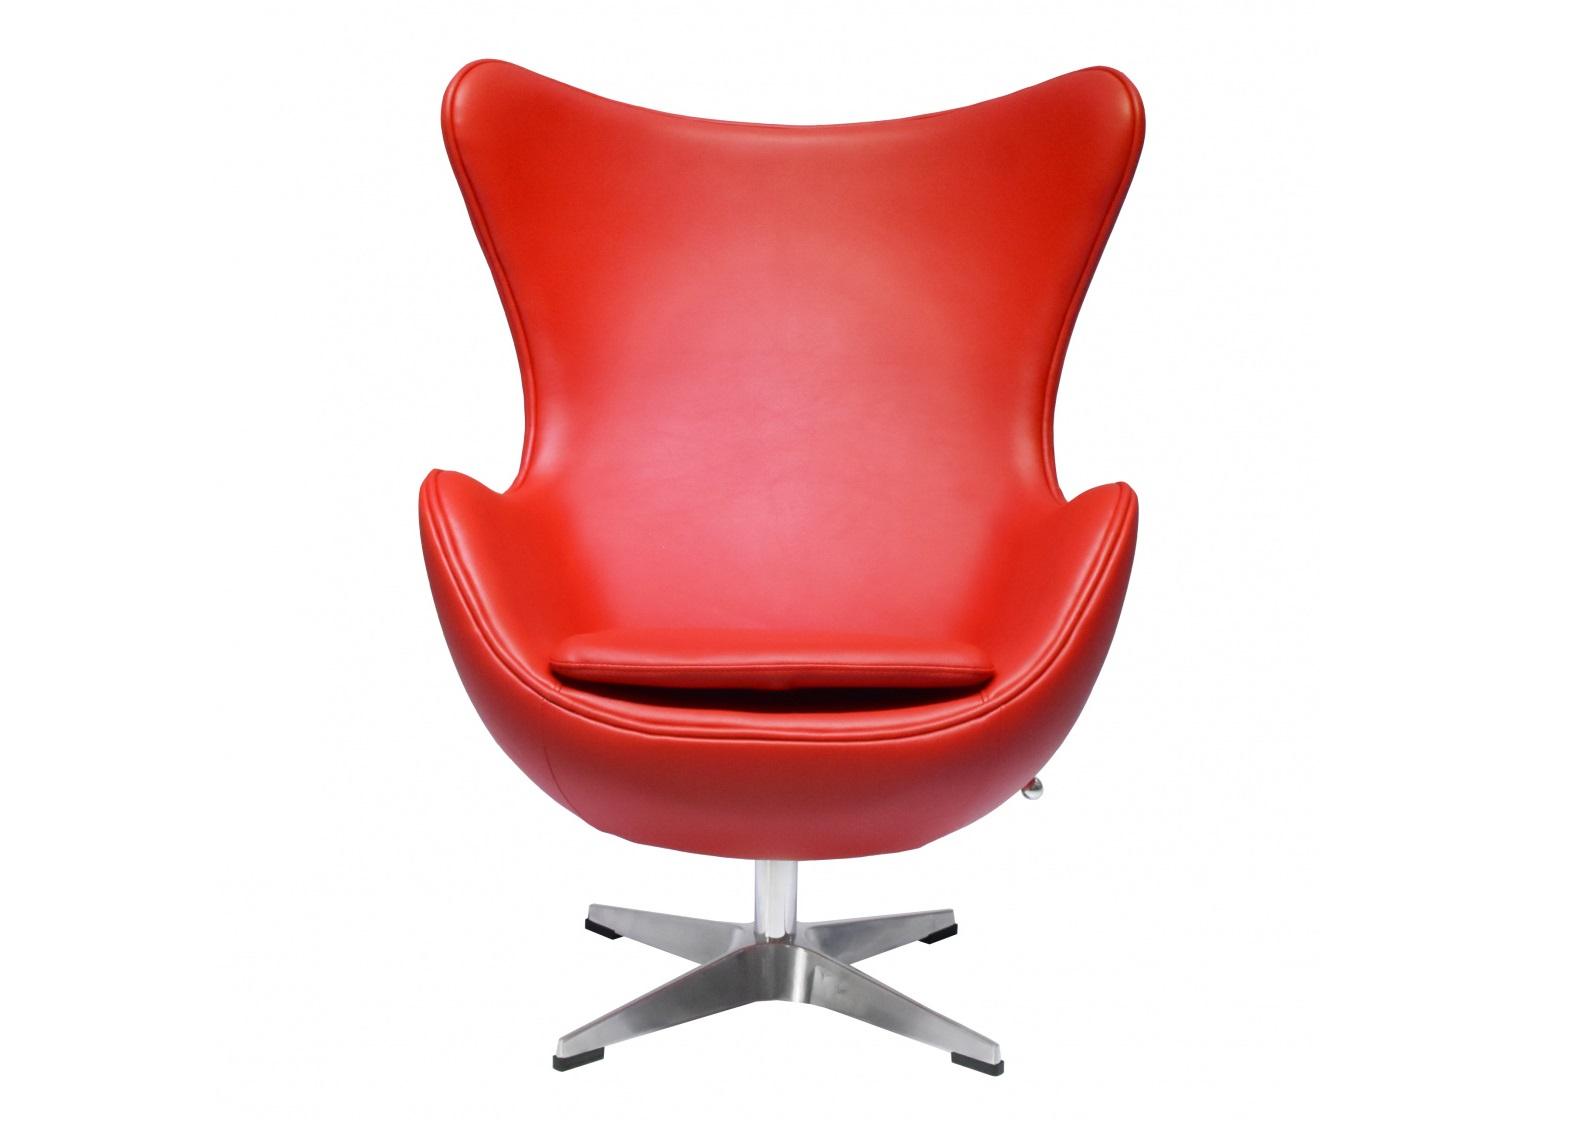 Кресло egg chair (bradexhome) красный 76x110x77 см.